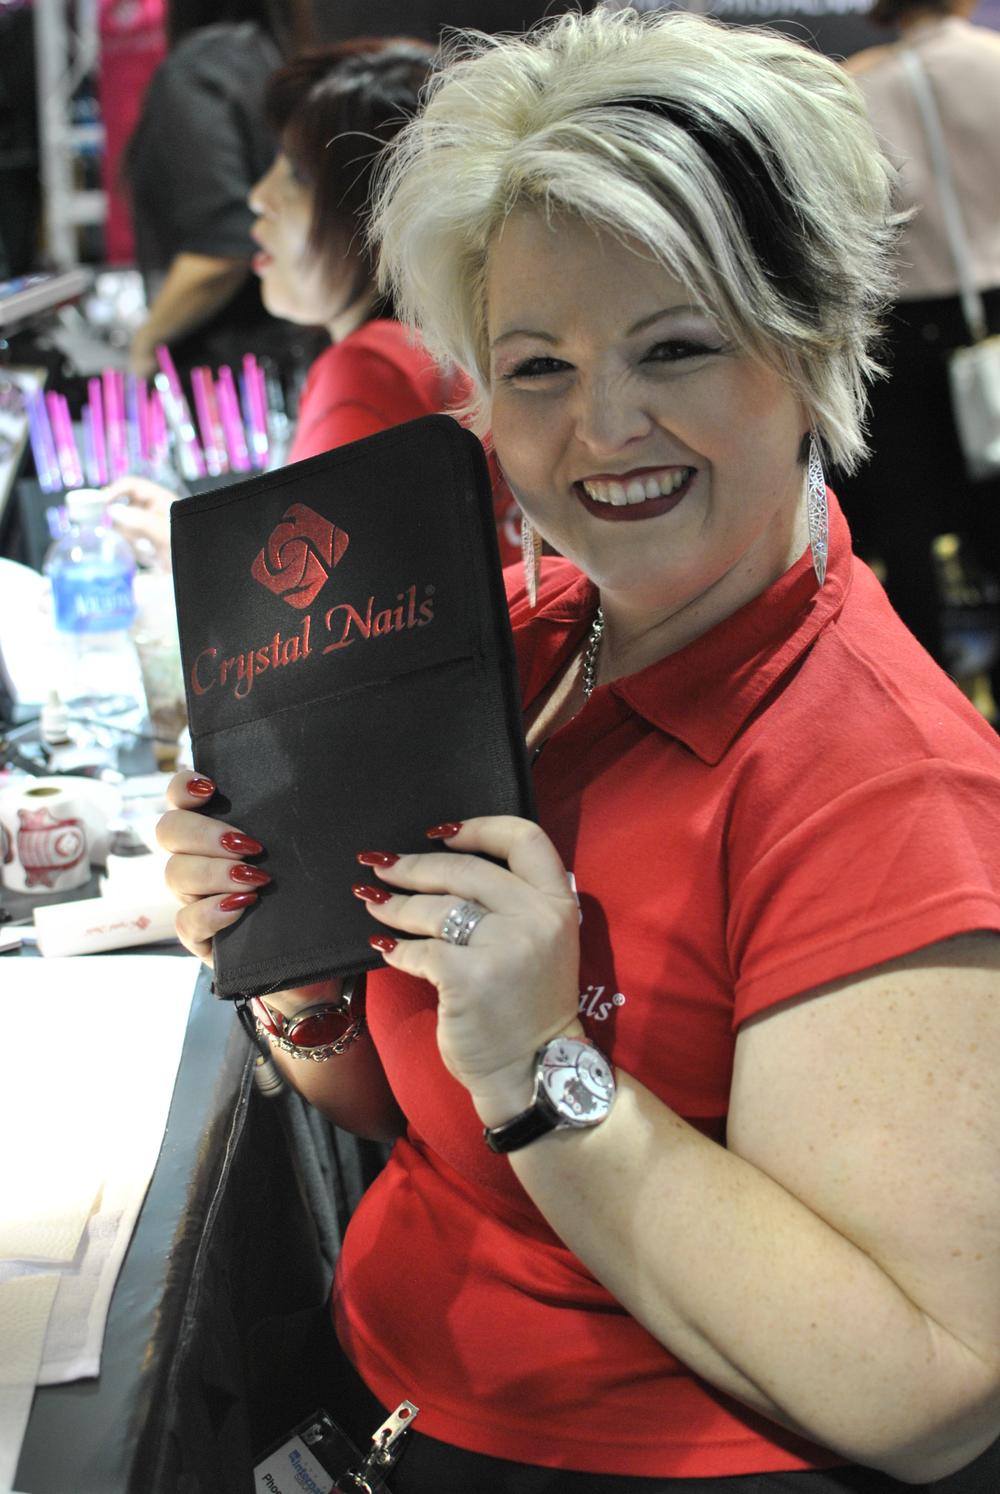 <p>Crystal Nails educator Phoenix Van Dyke holds up her favorite brush organizer.</p>